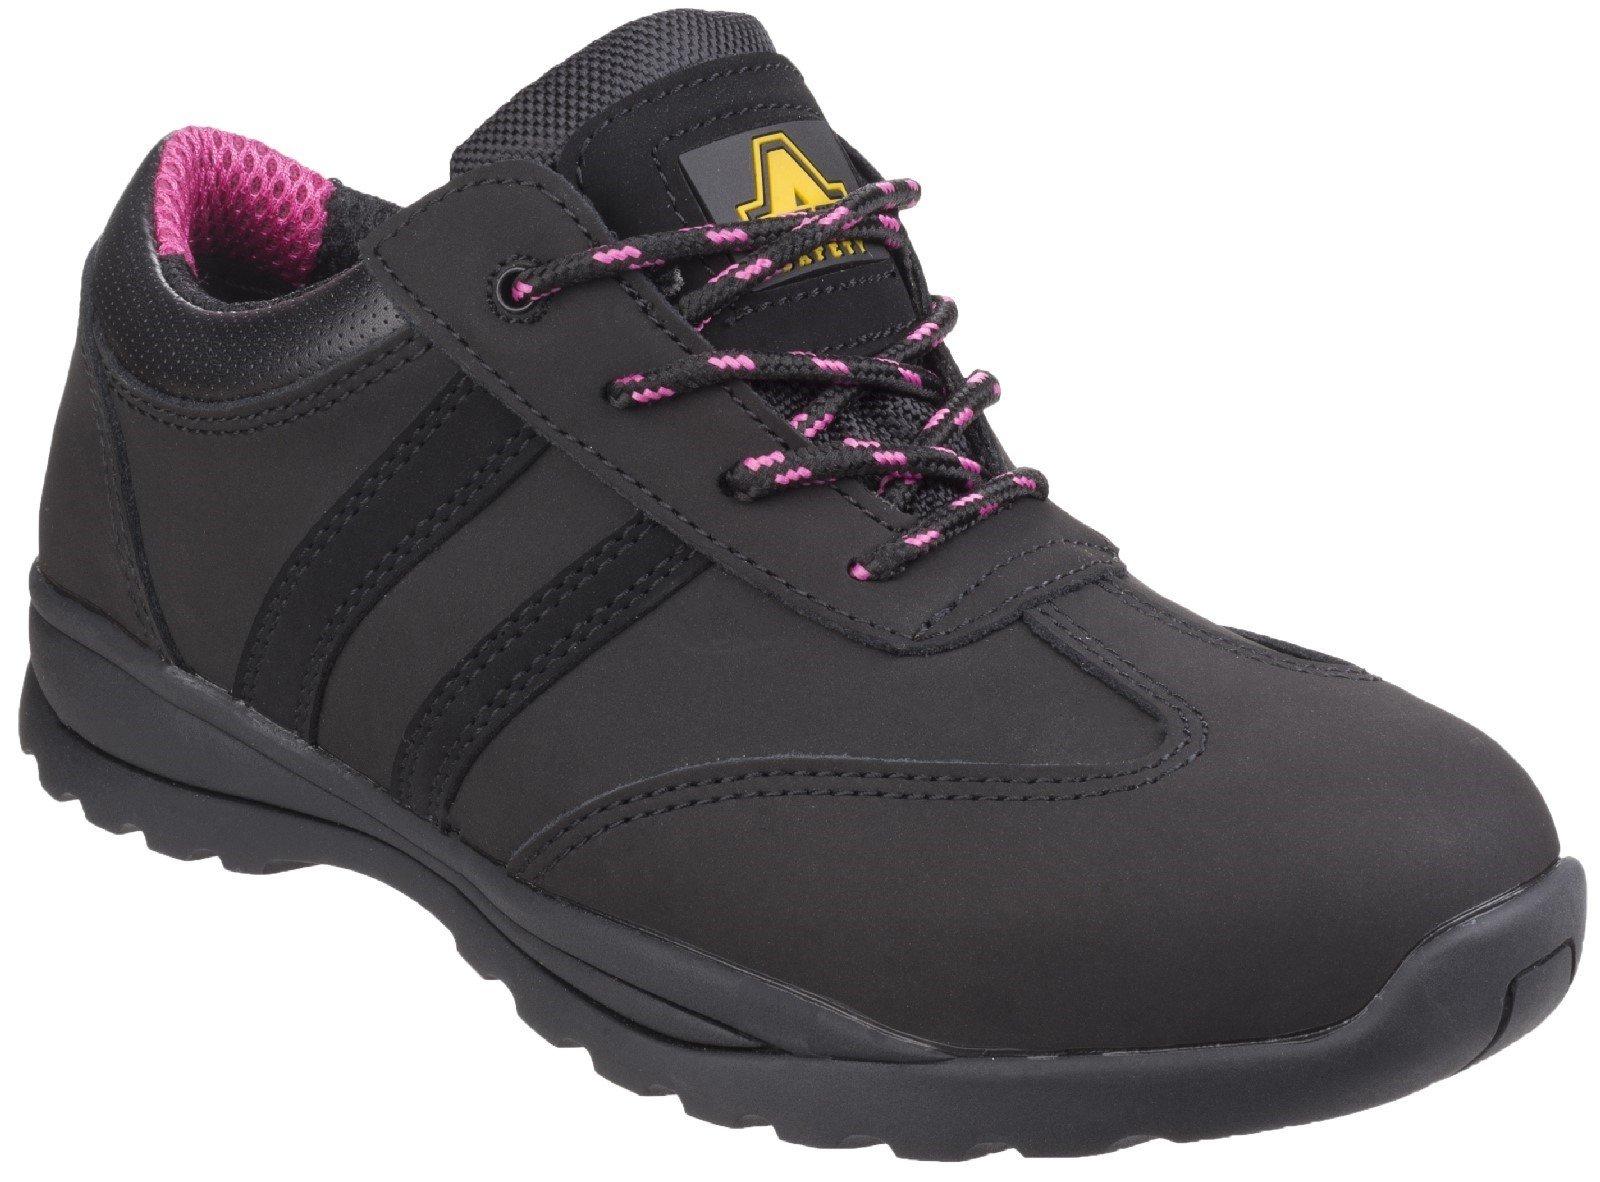 Amblers Women's Safety Sophie Lace Up Trainer Black 24927 - Black 2